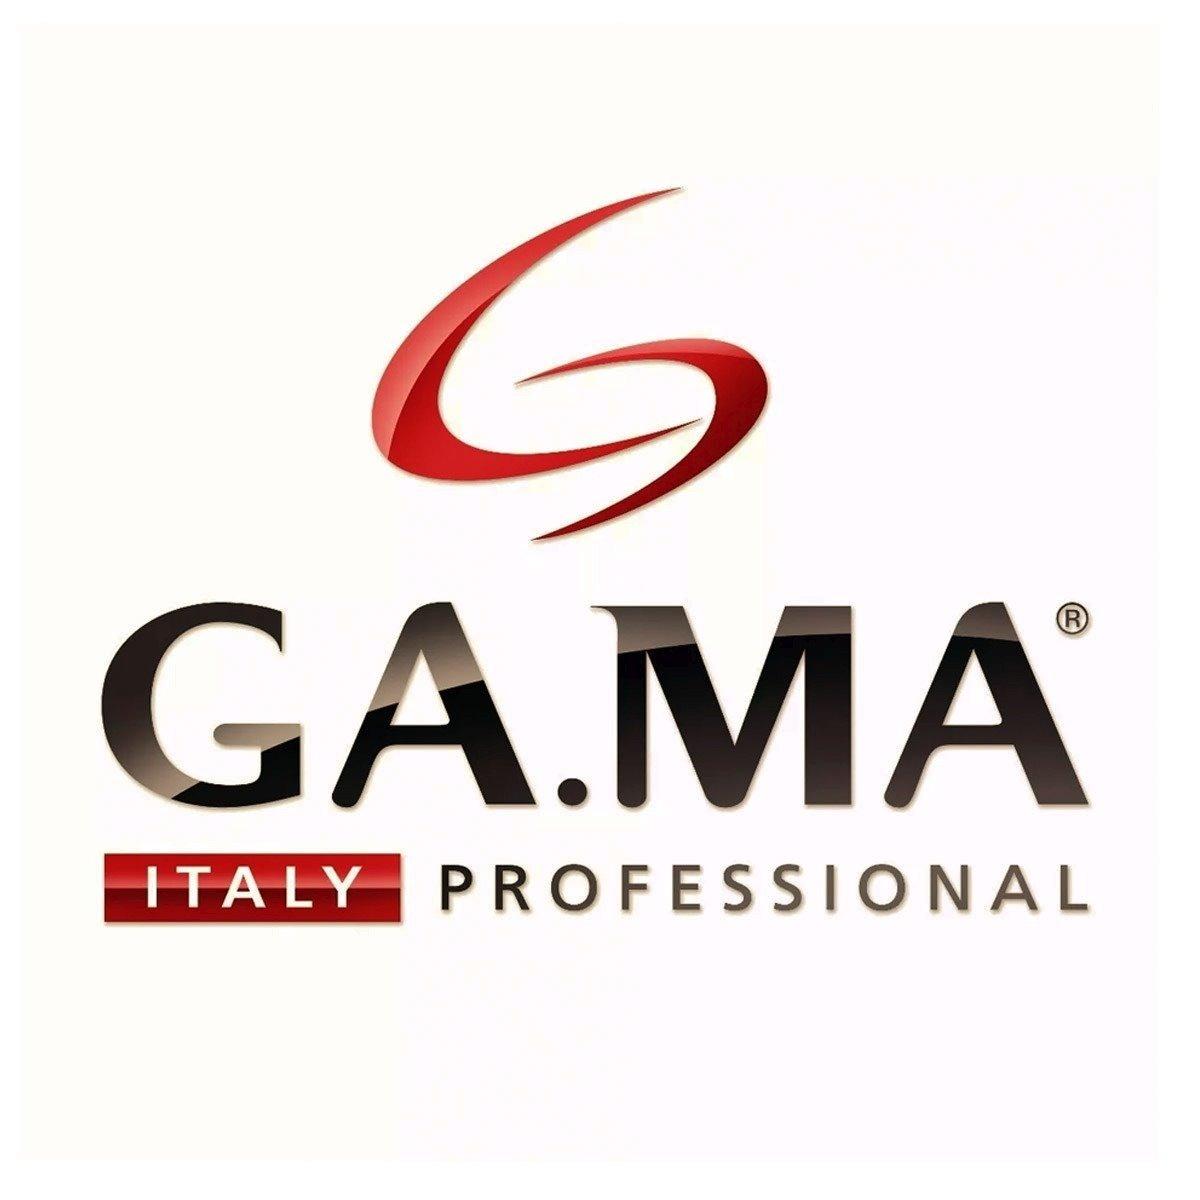 Cortadora De Pelo Barba Gama Gm560 24 Piezas Gran Potencia O -   749 ... 58f46a0ae53b